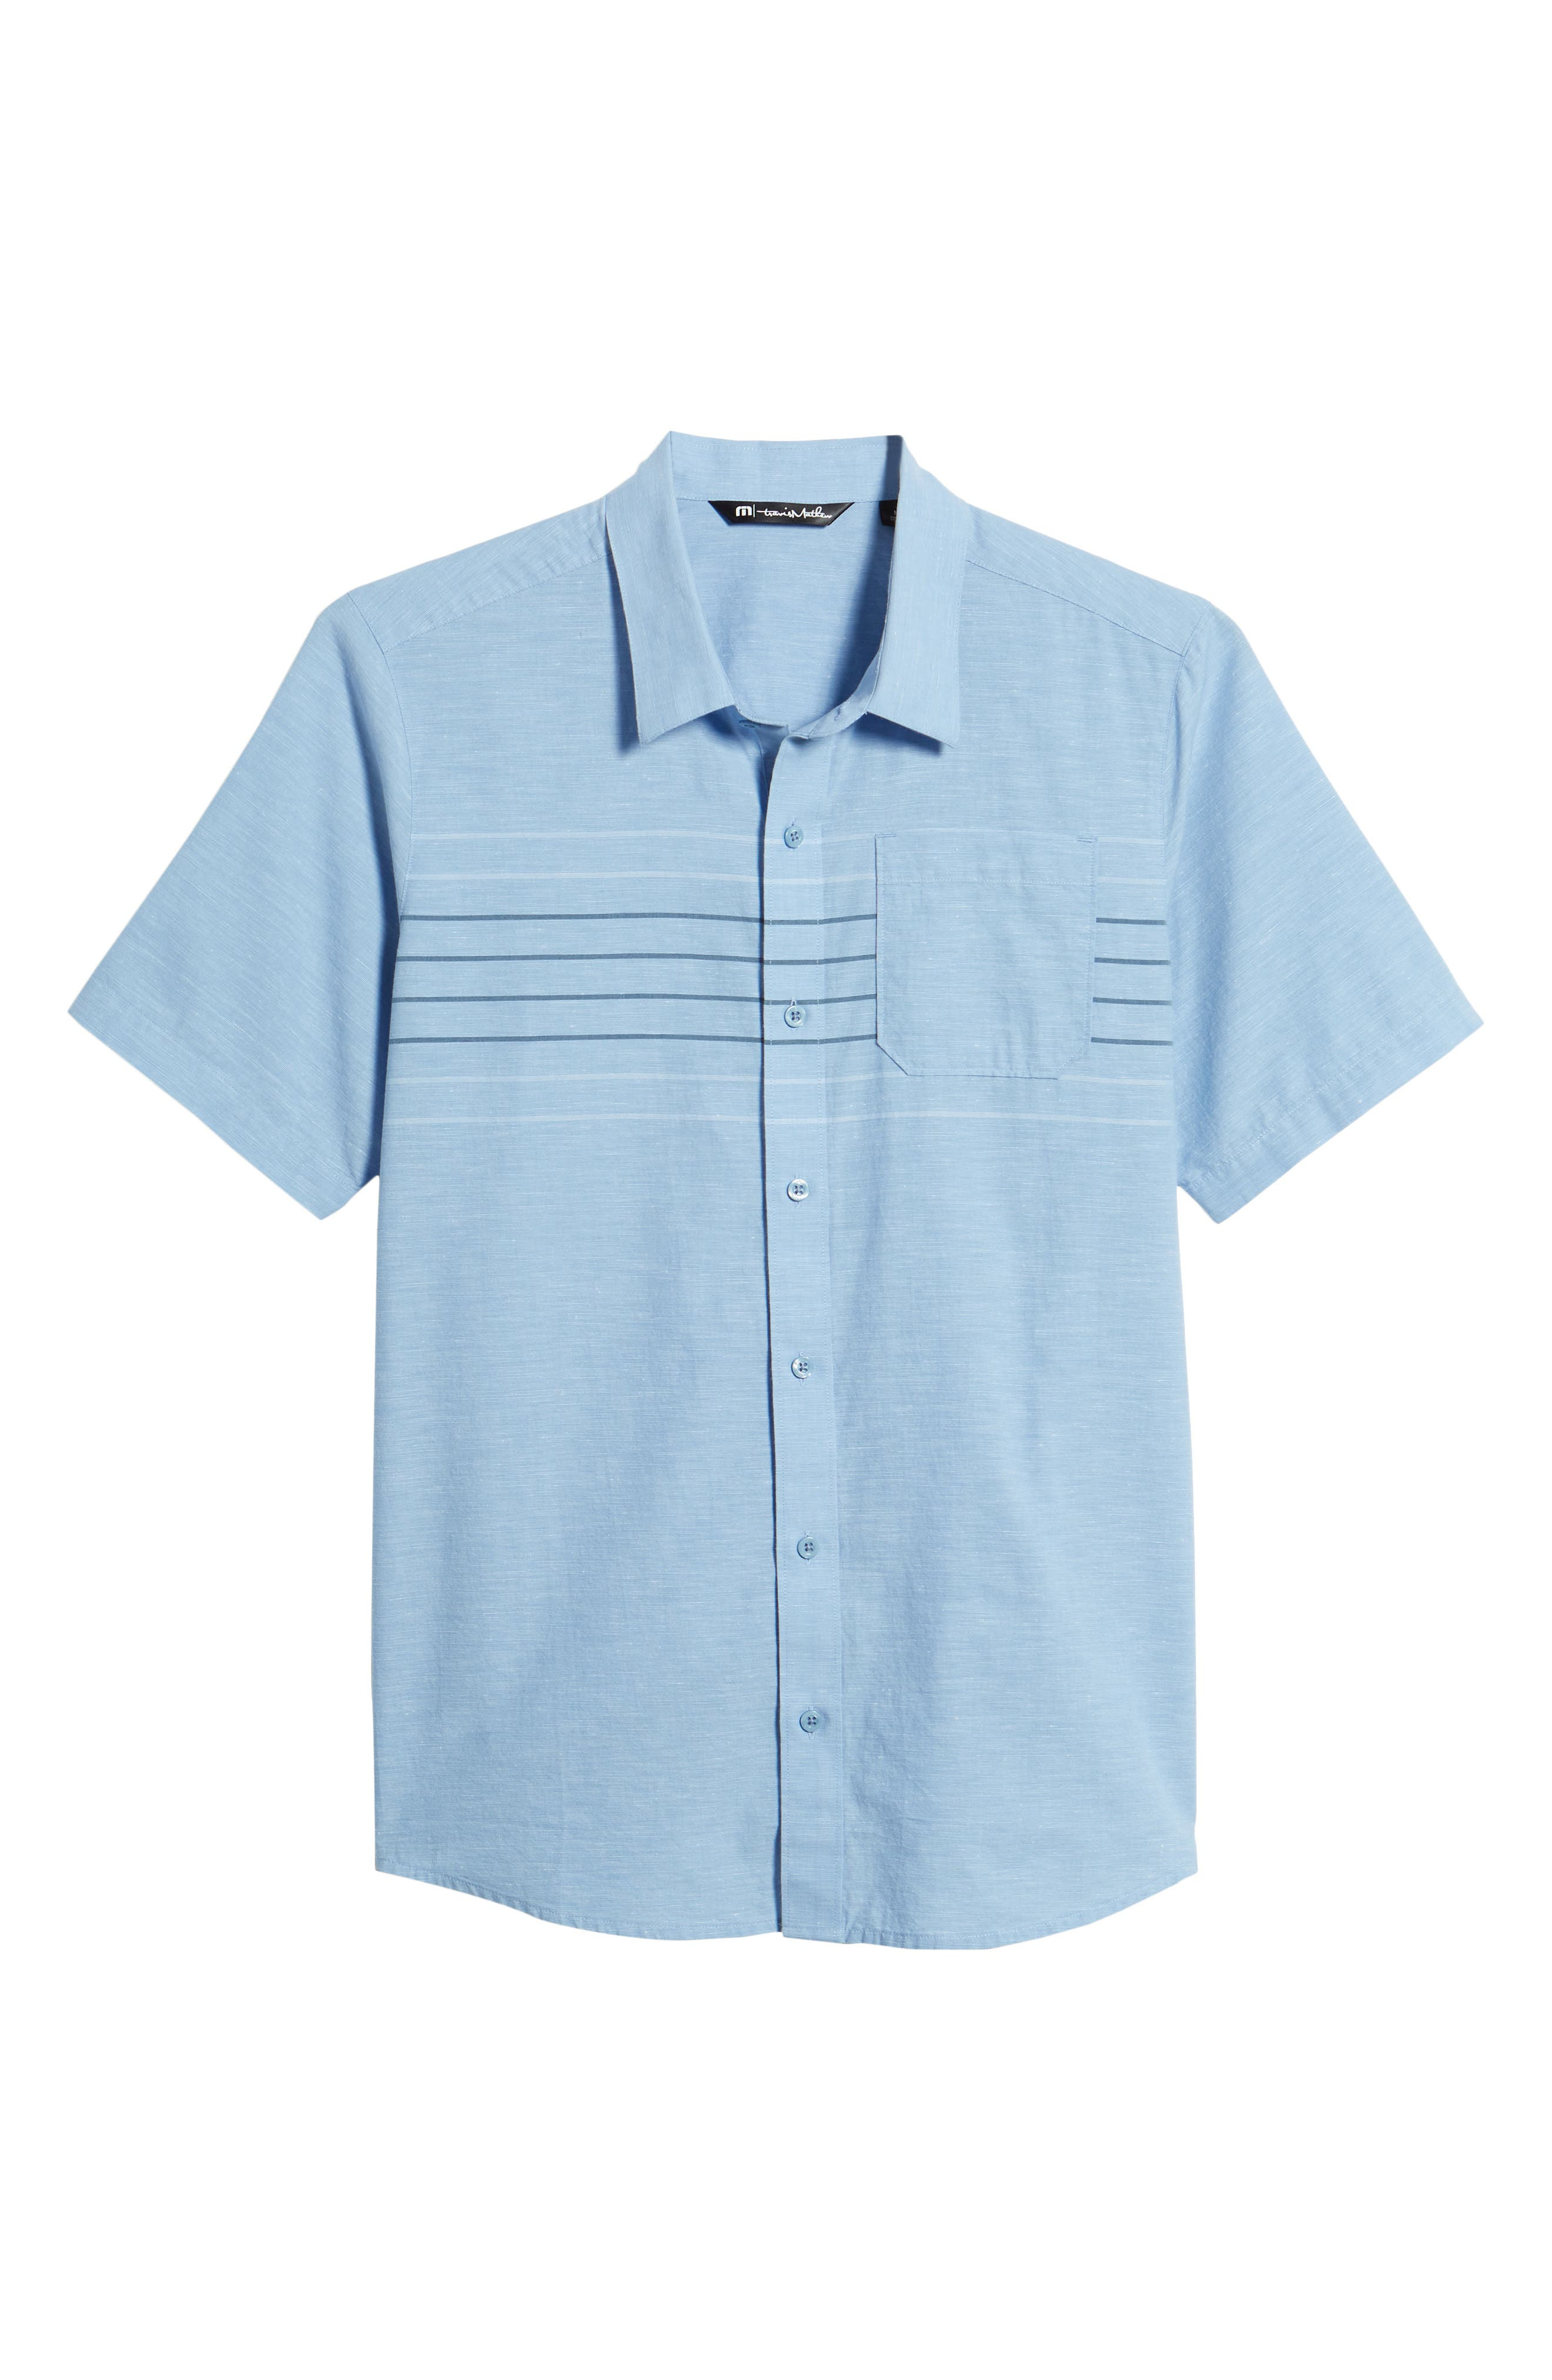 Canal Street Sport Shirt,                             Alternate thumbnail 6, color,                             Heather Allure